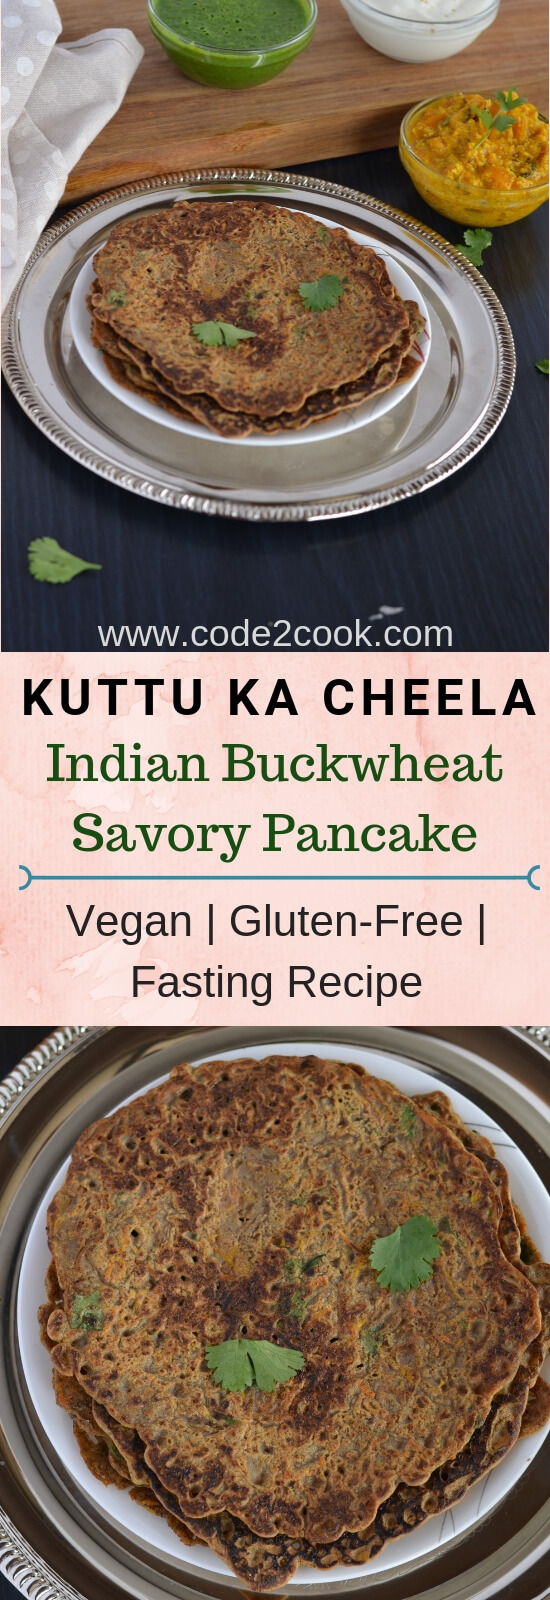 pinterest image for kuttu cheela or savory buckwheat crepe